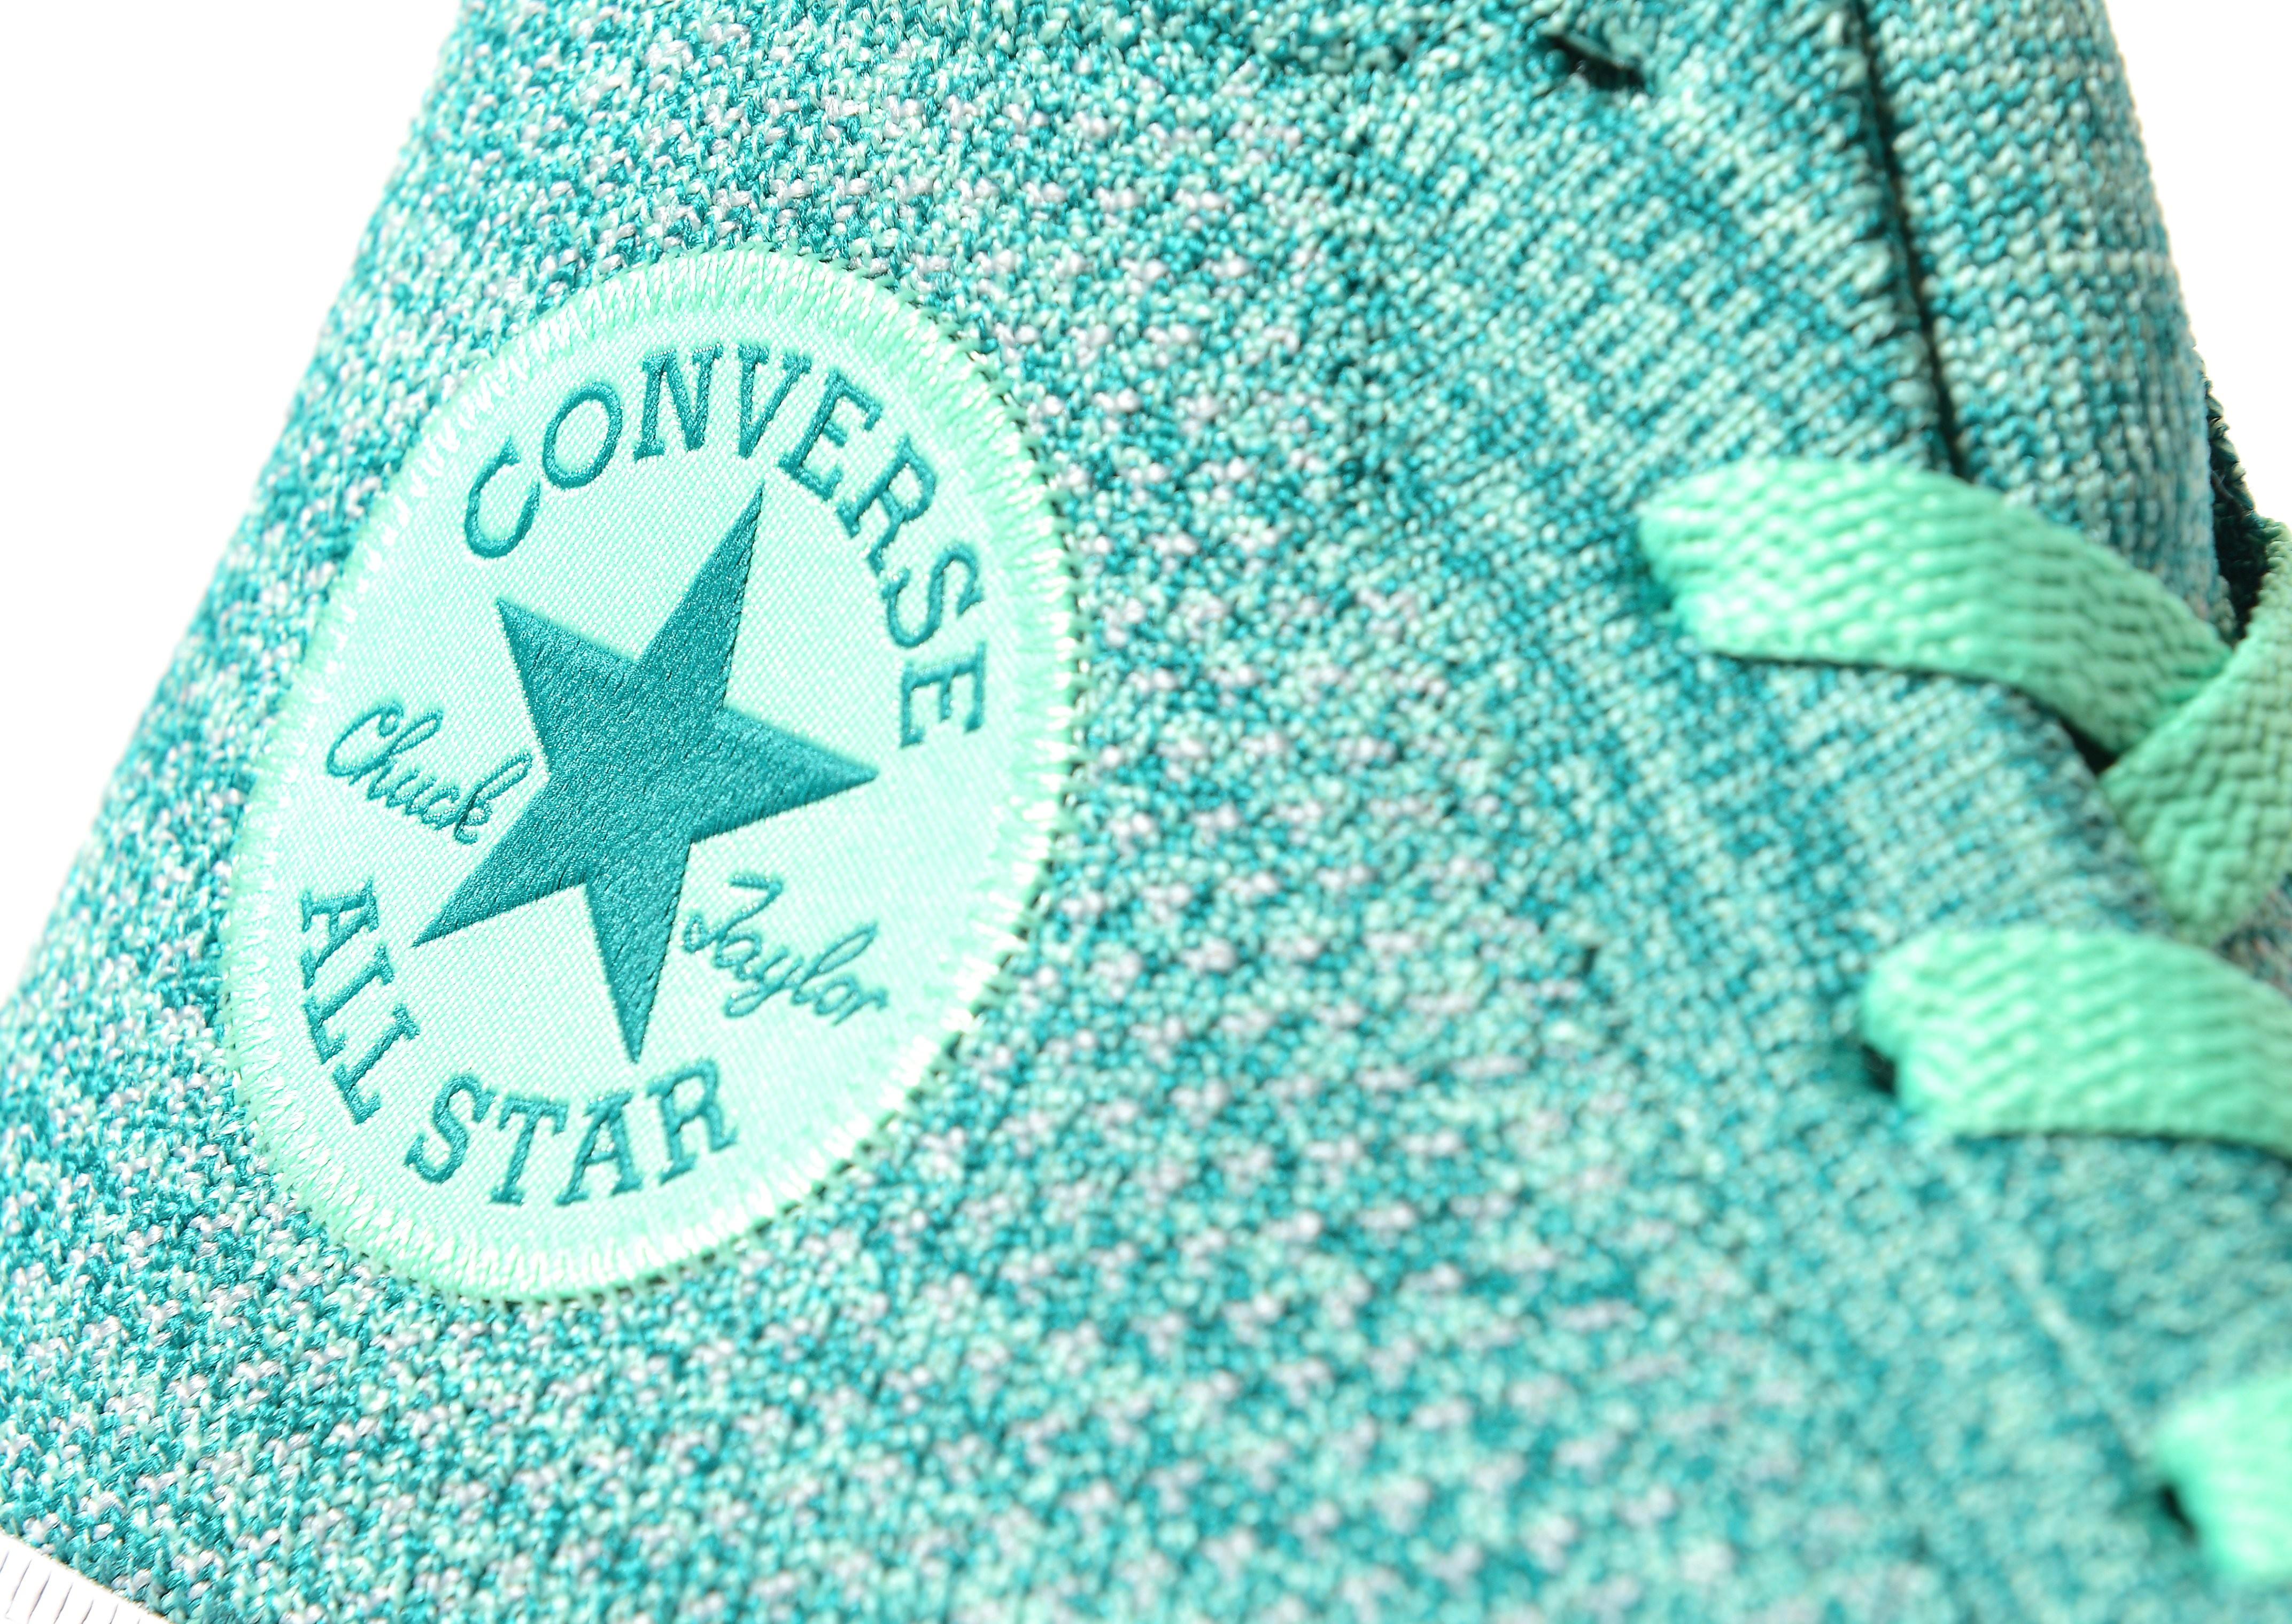 Converse Chuck Taylor All Star x Flyknit Femme